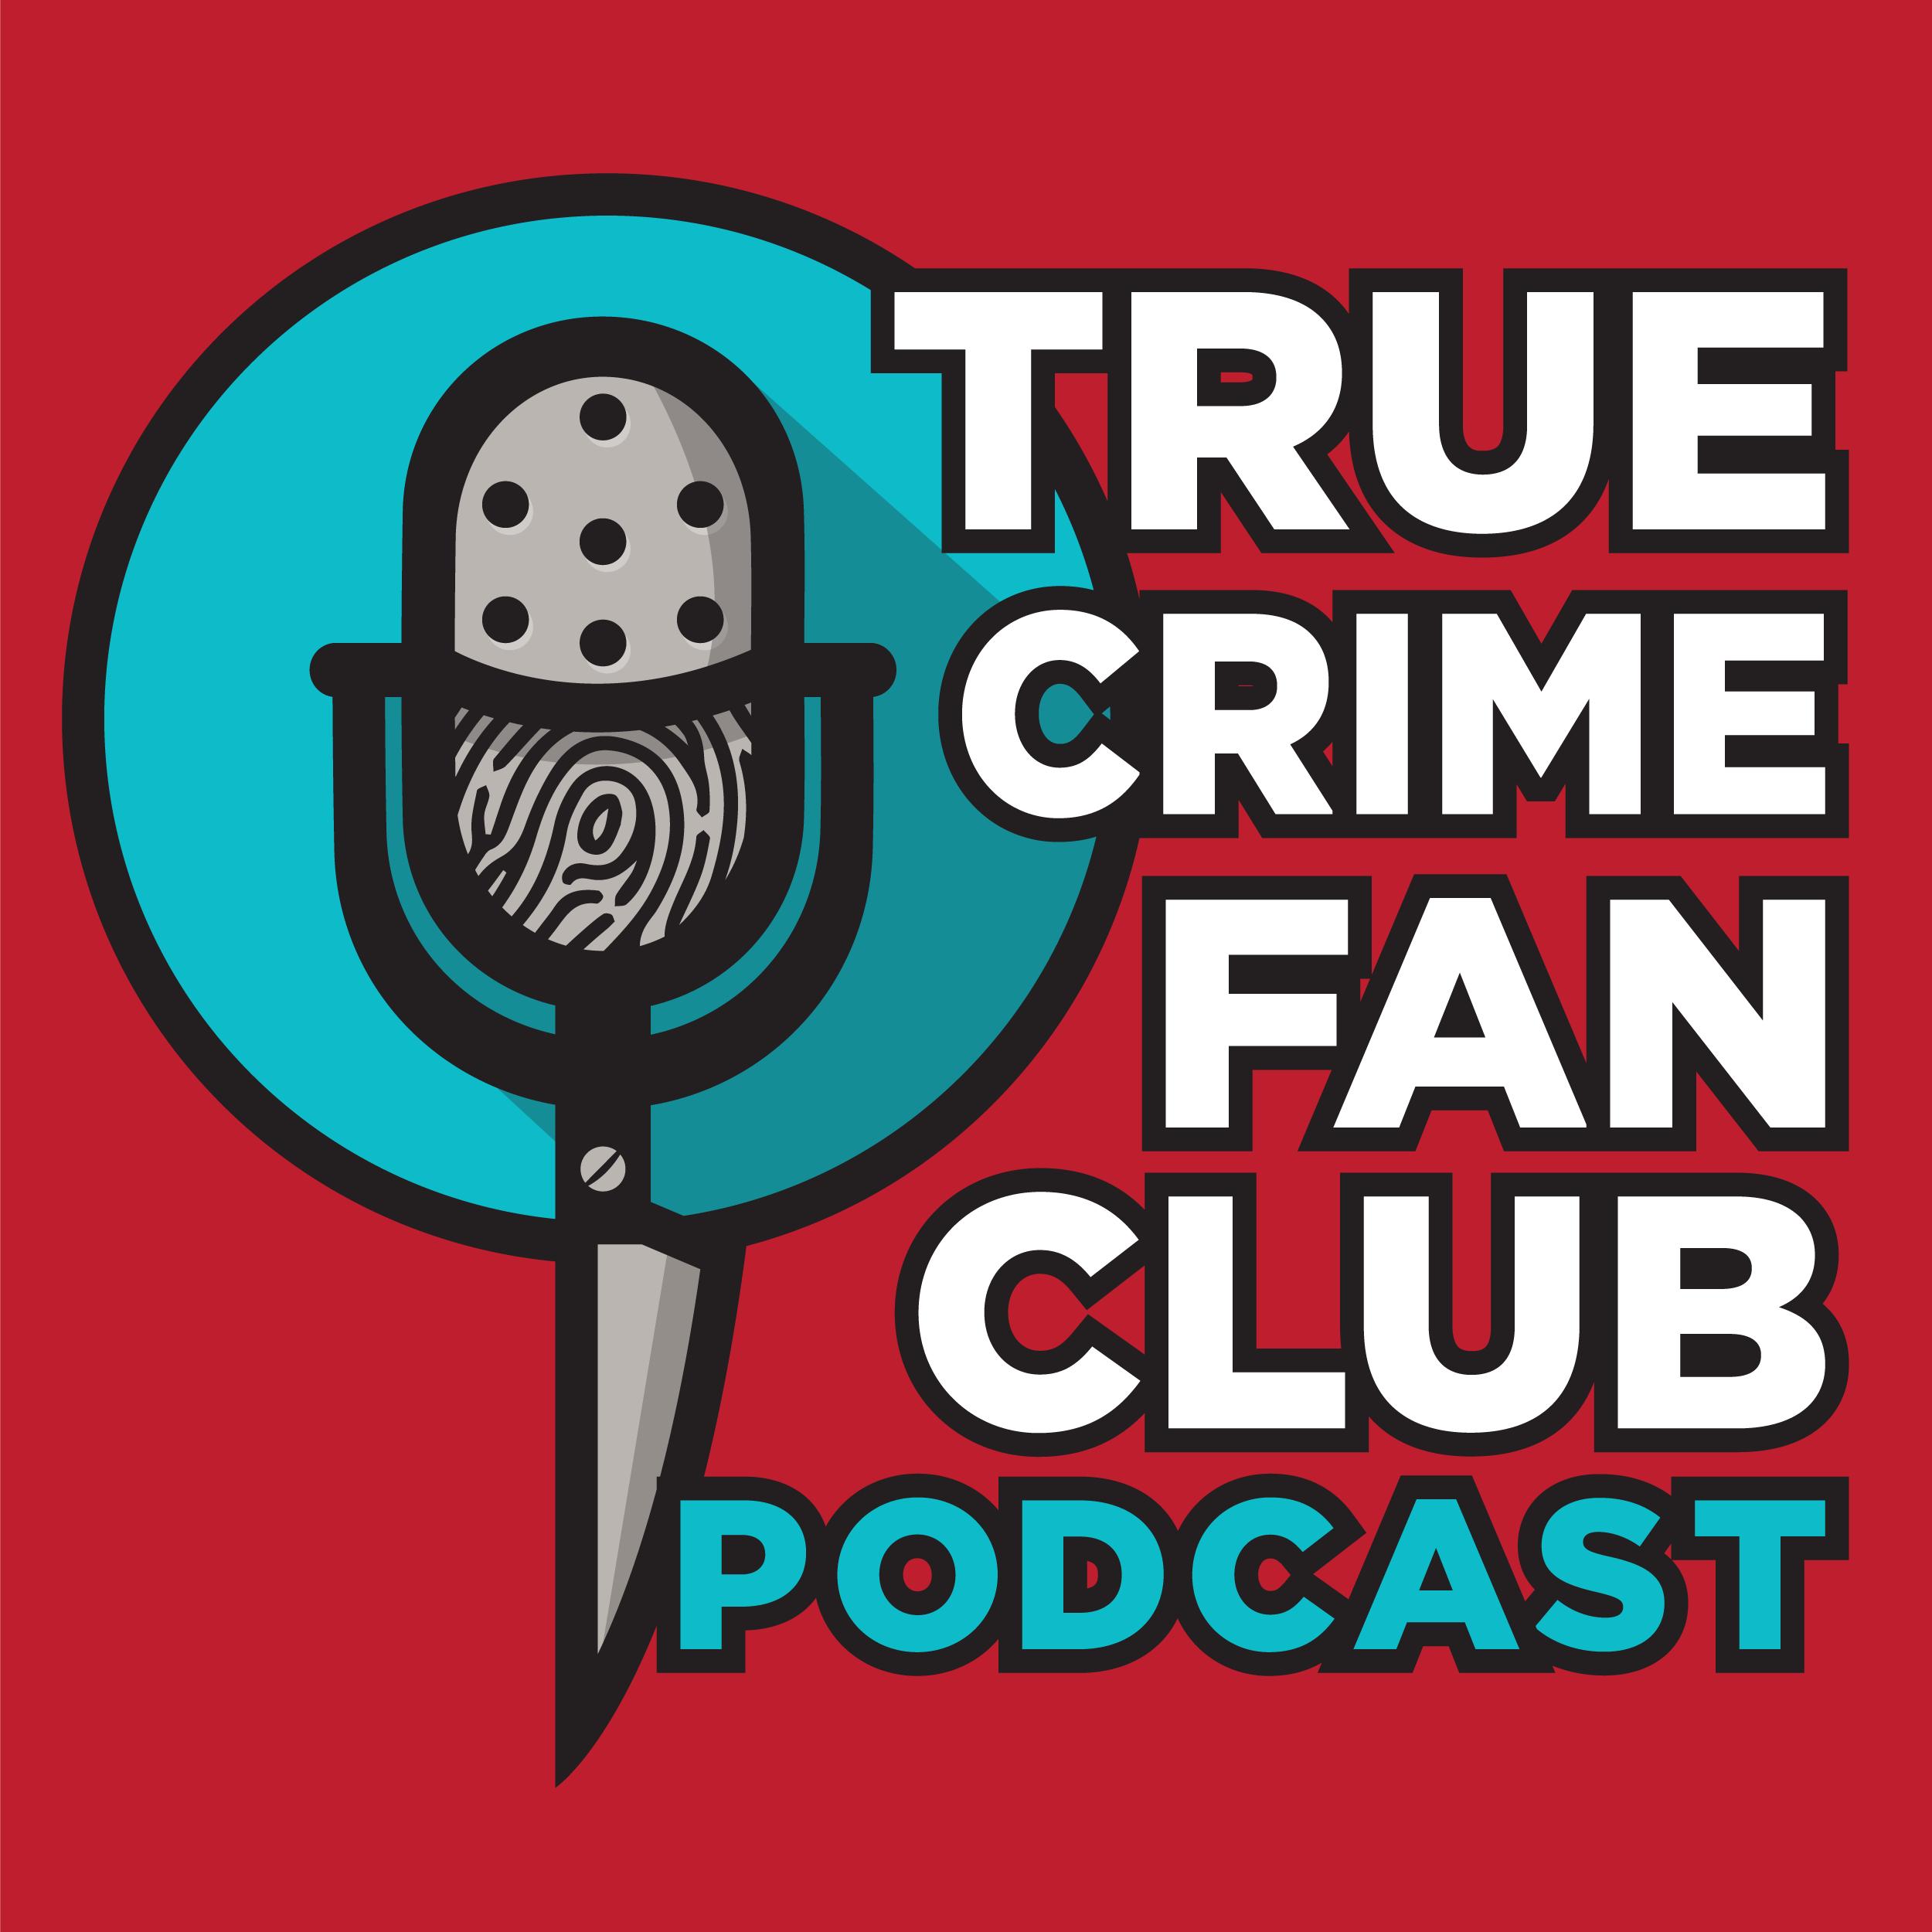 True Crime Fan Club Podcast